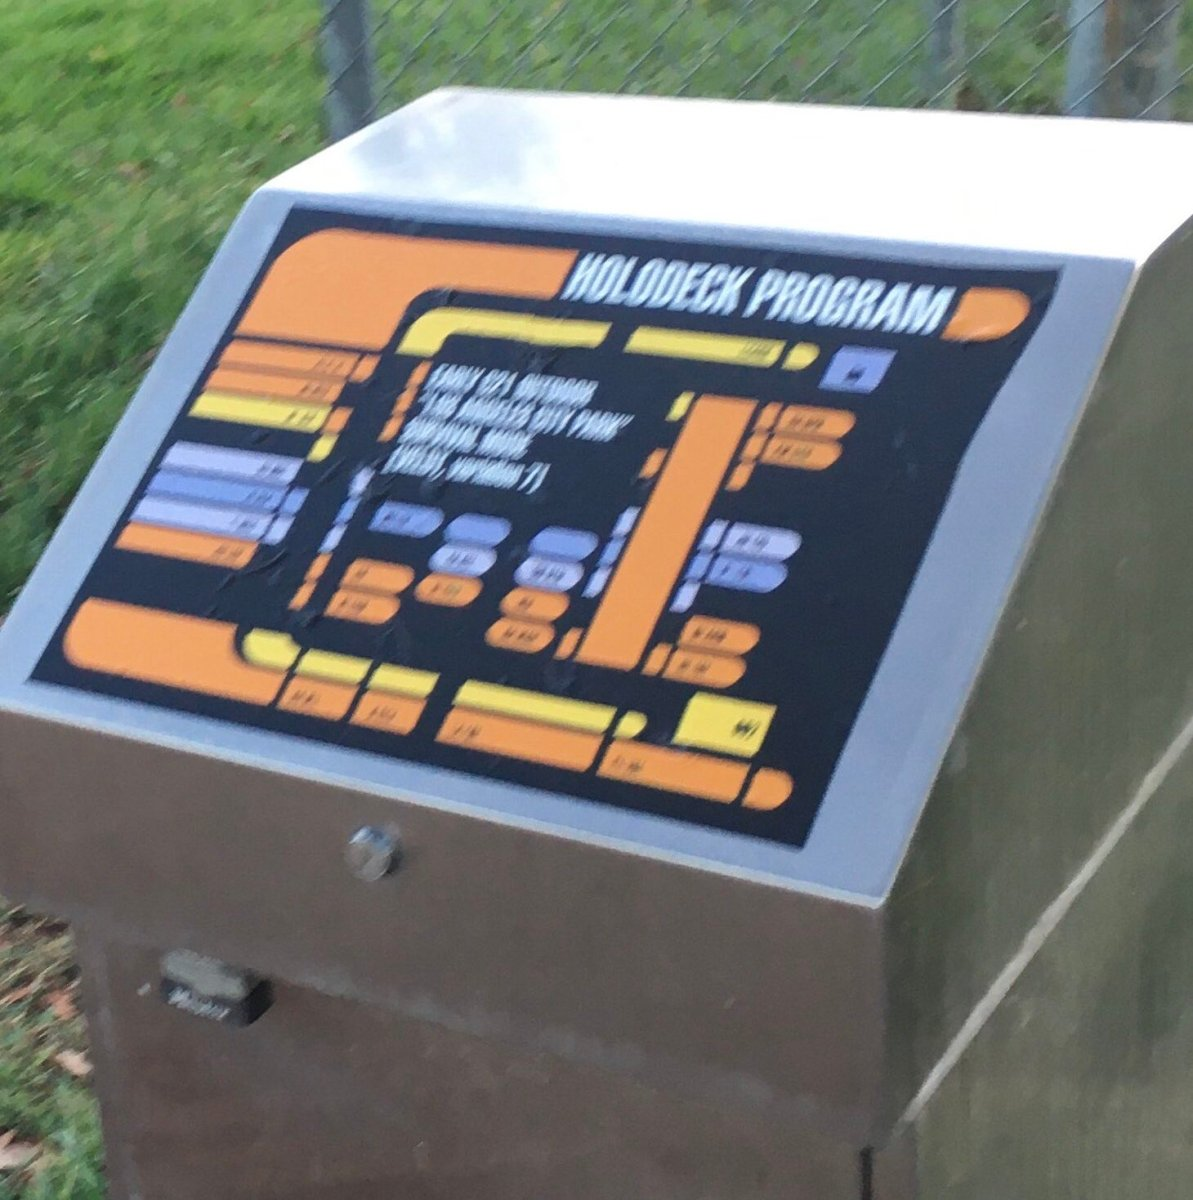 Holodeck Program interface spotted in LA city park